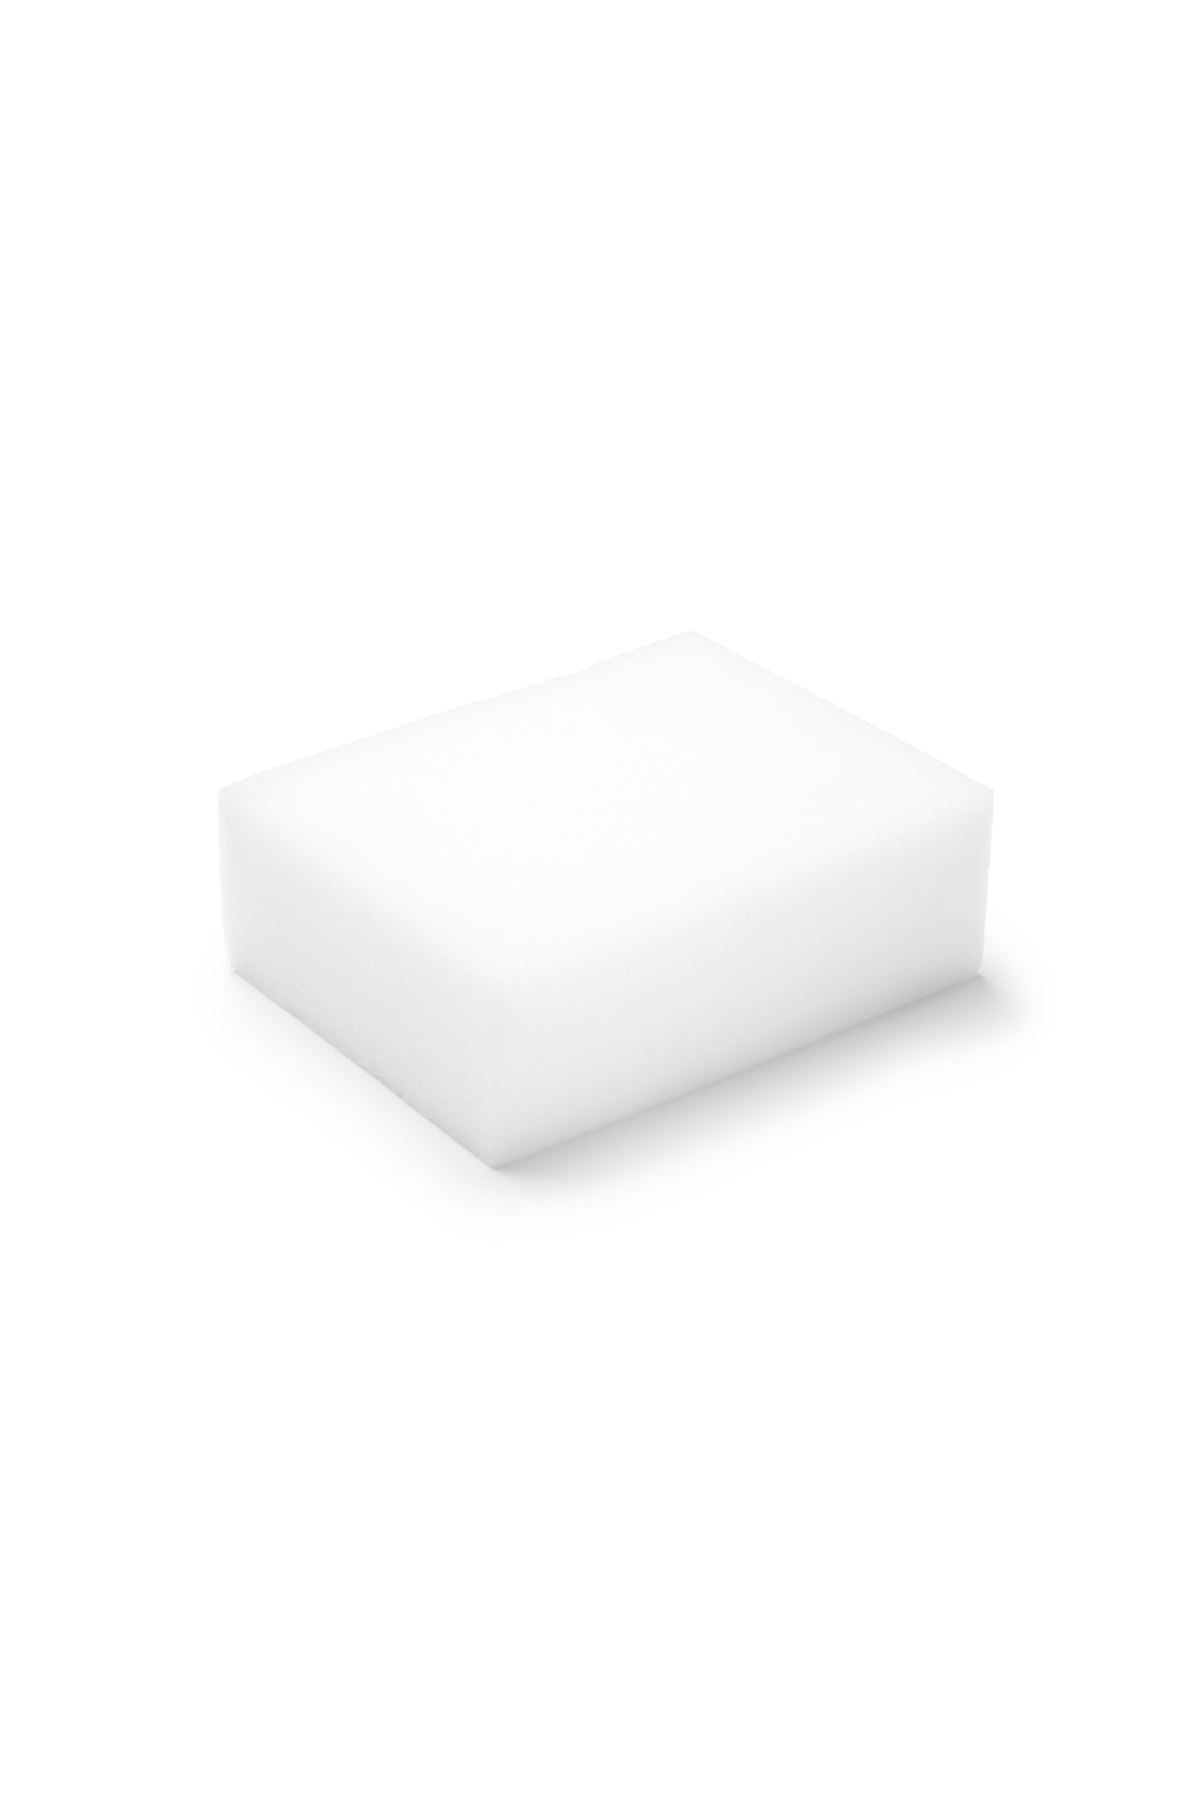 Technolog 6,5x10cm Sihirli Sünger - Beyaz